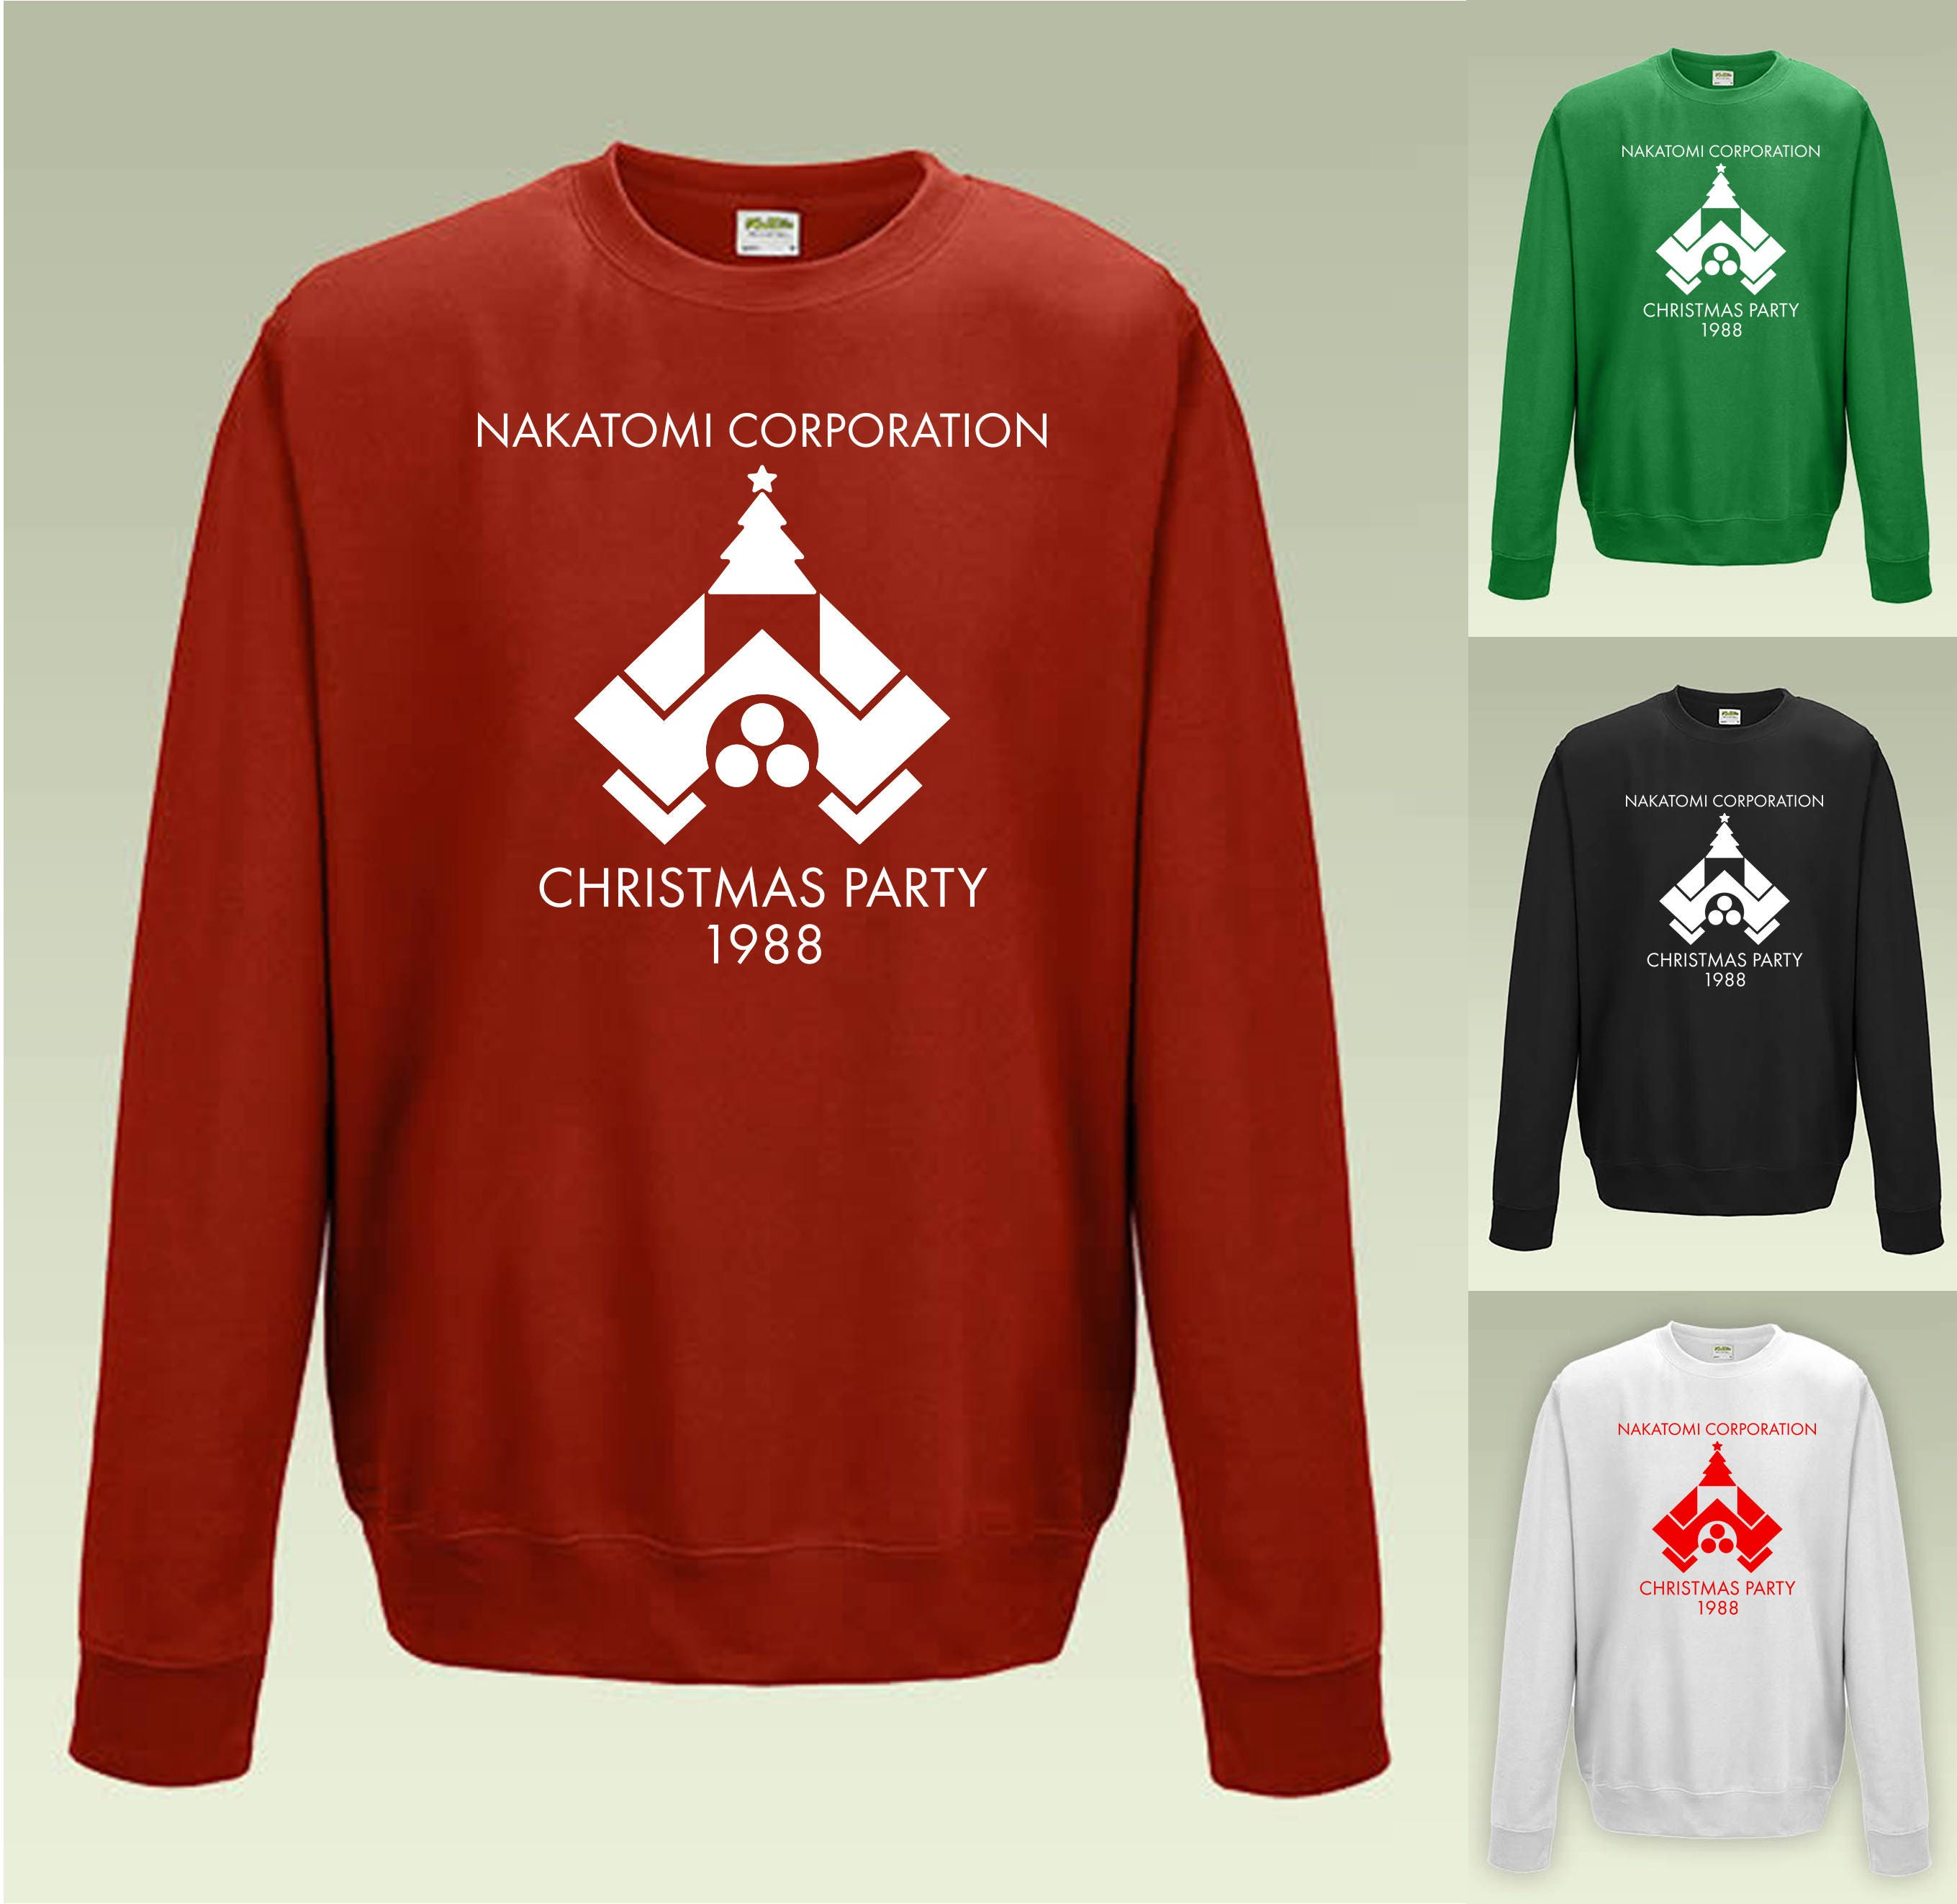 bbf6828cb Nakatomi Corporation Christmas Party Sweatshirt JH030 Funny | Etsy